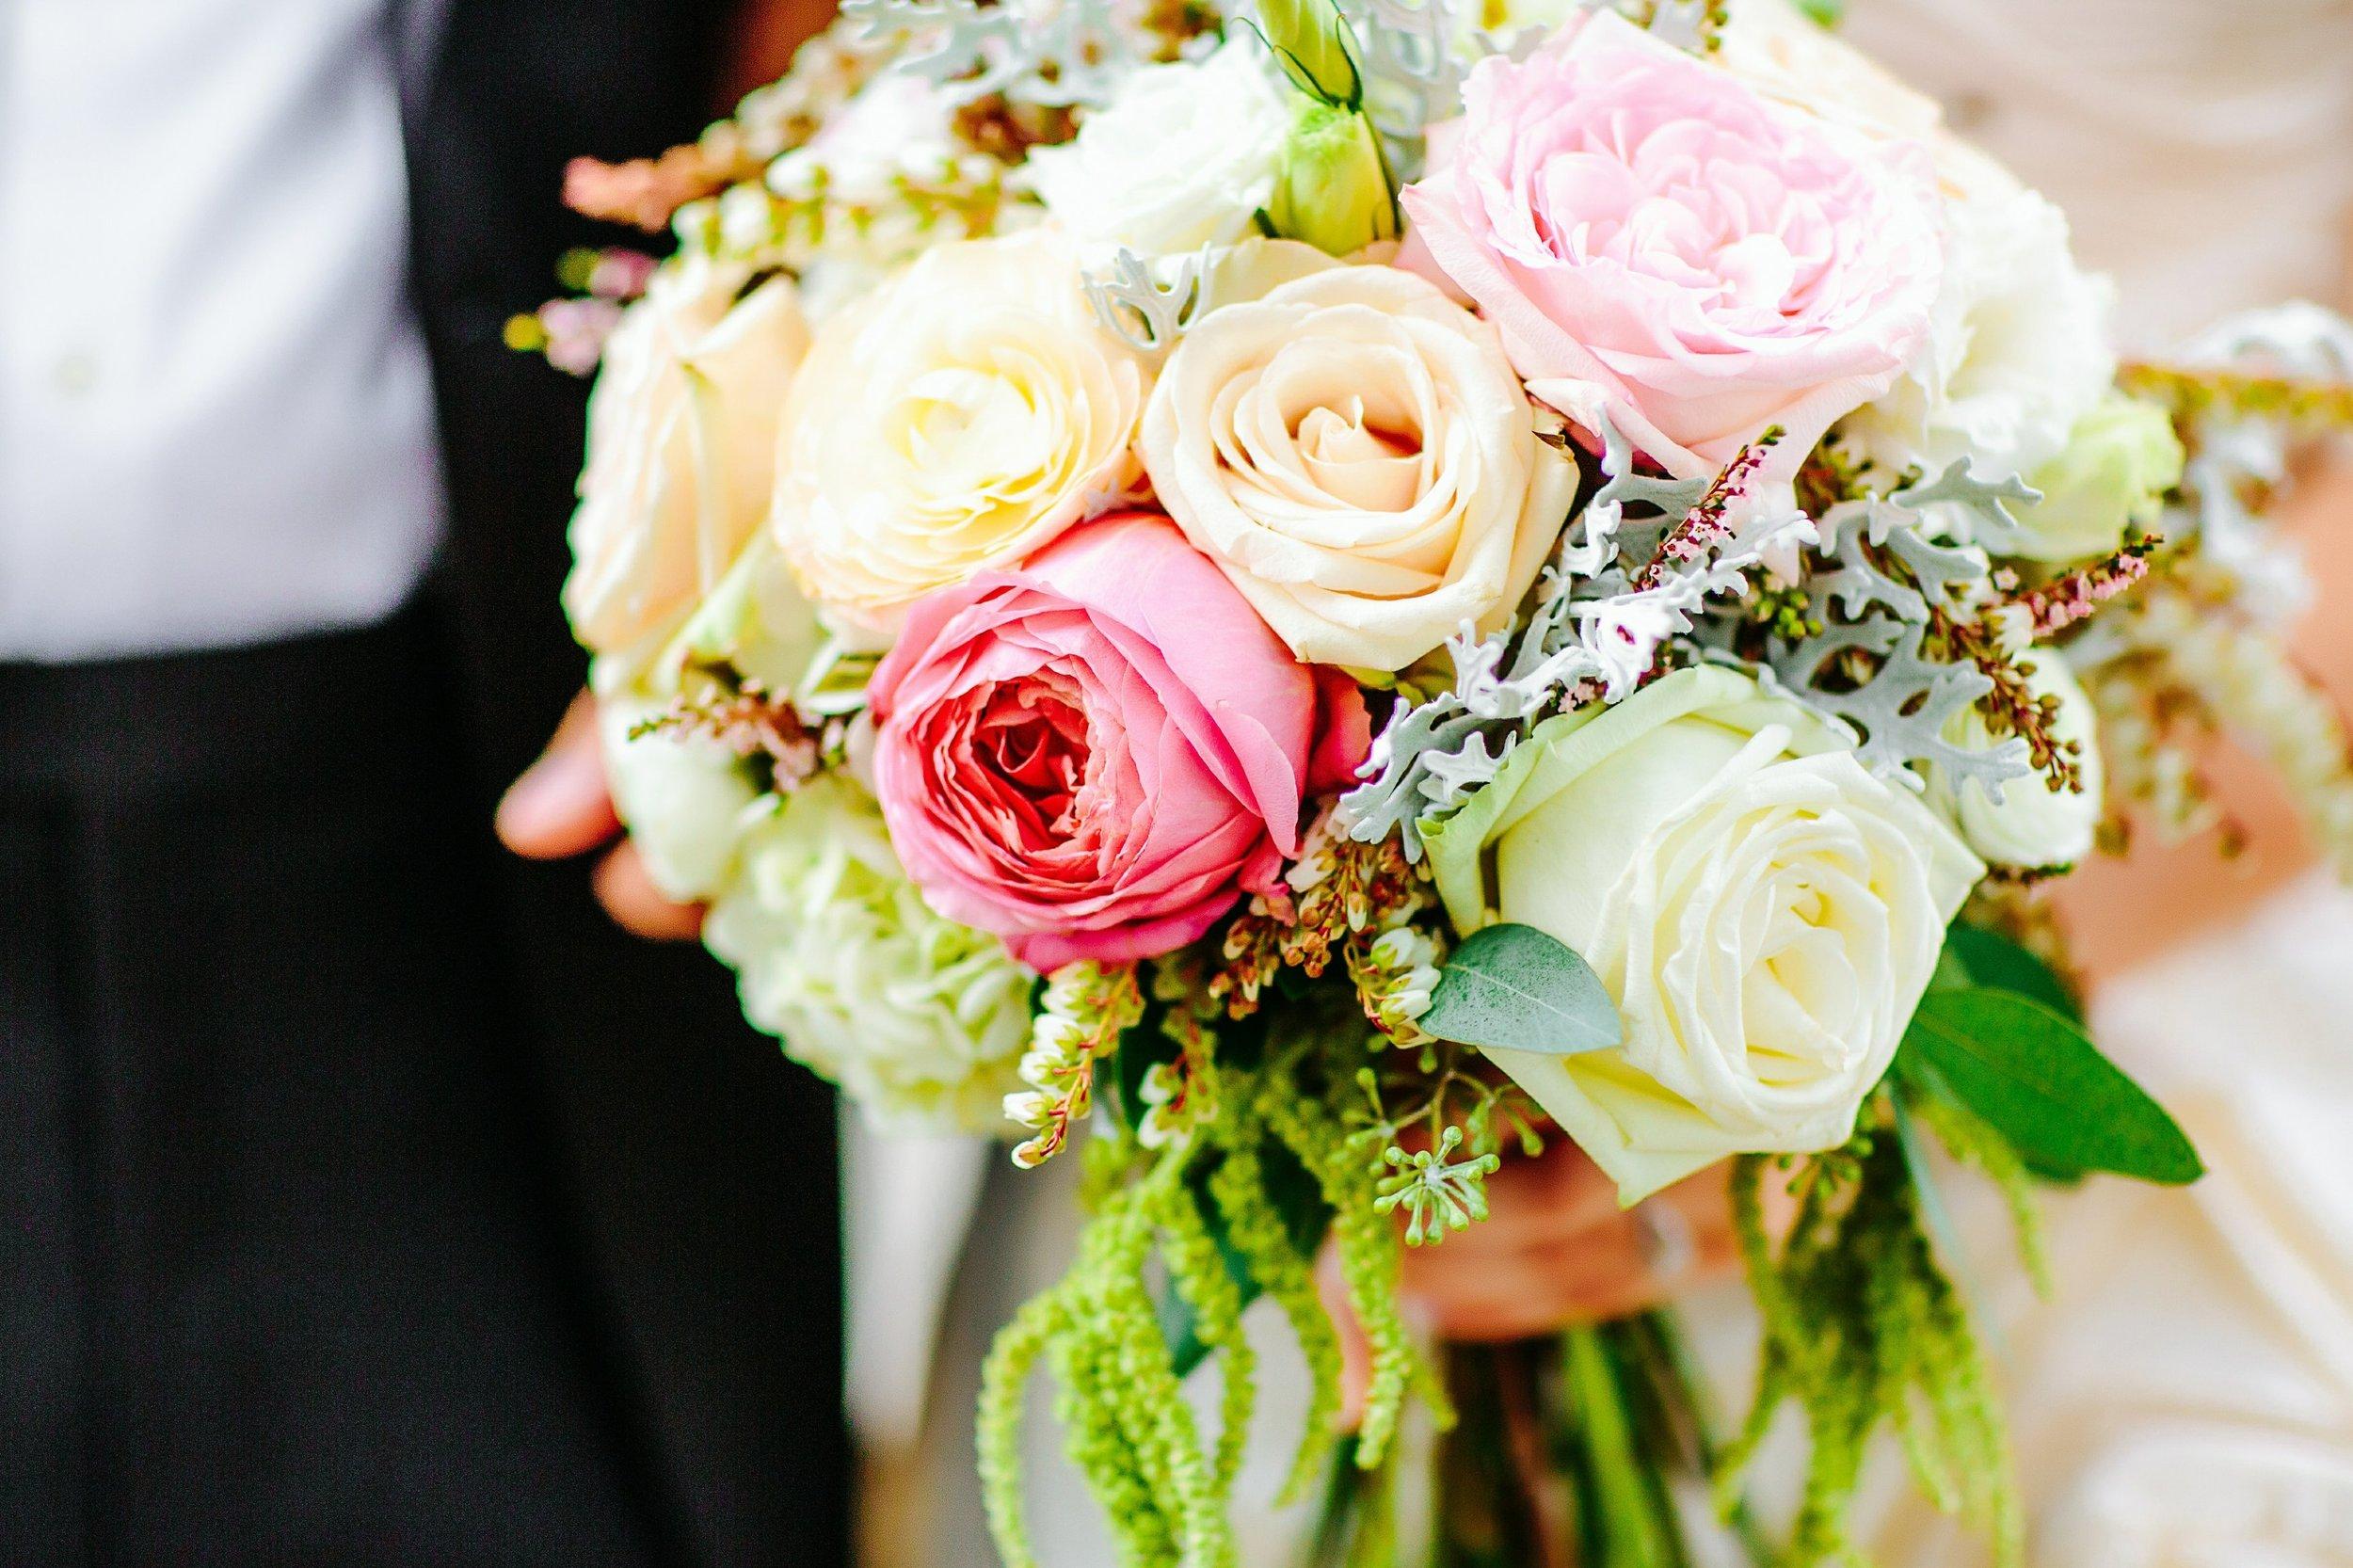 jessica_yoni_bride_groom-00118.jpg